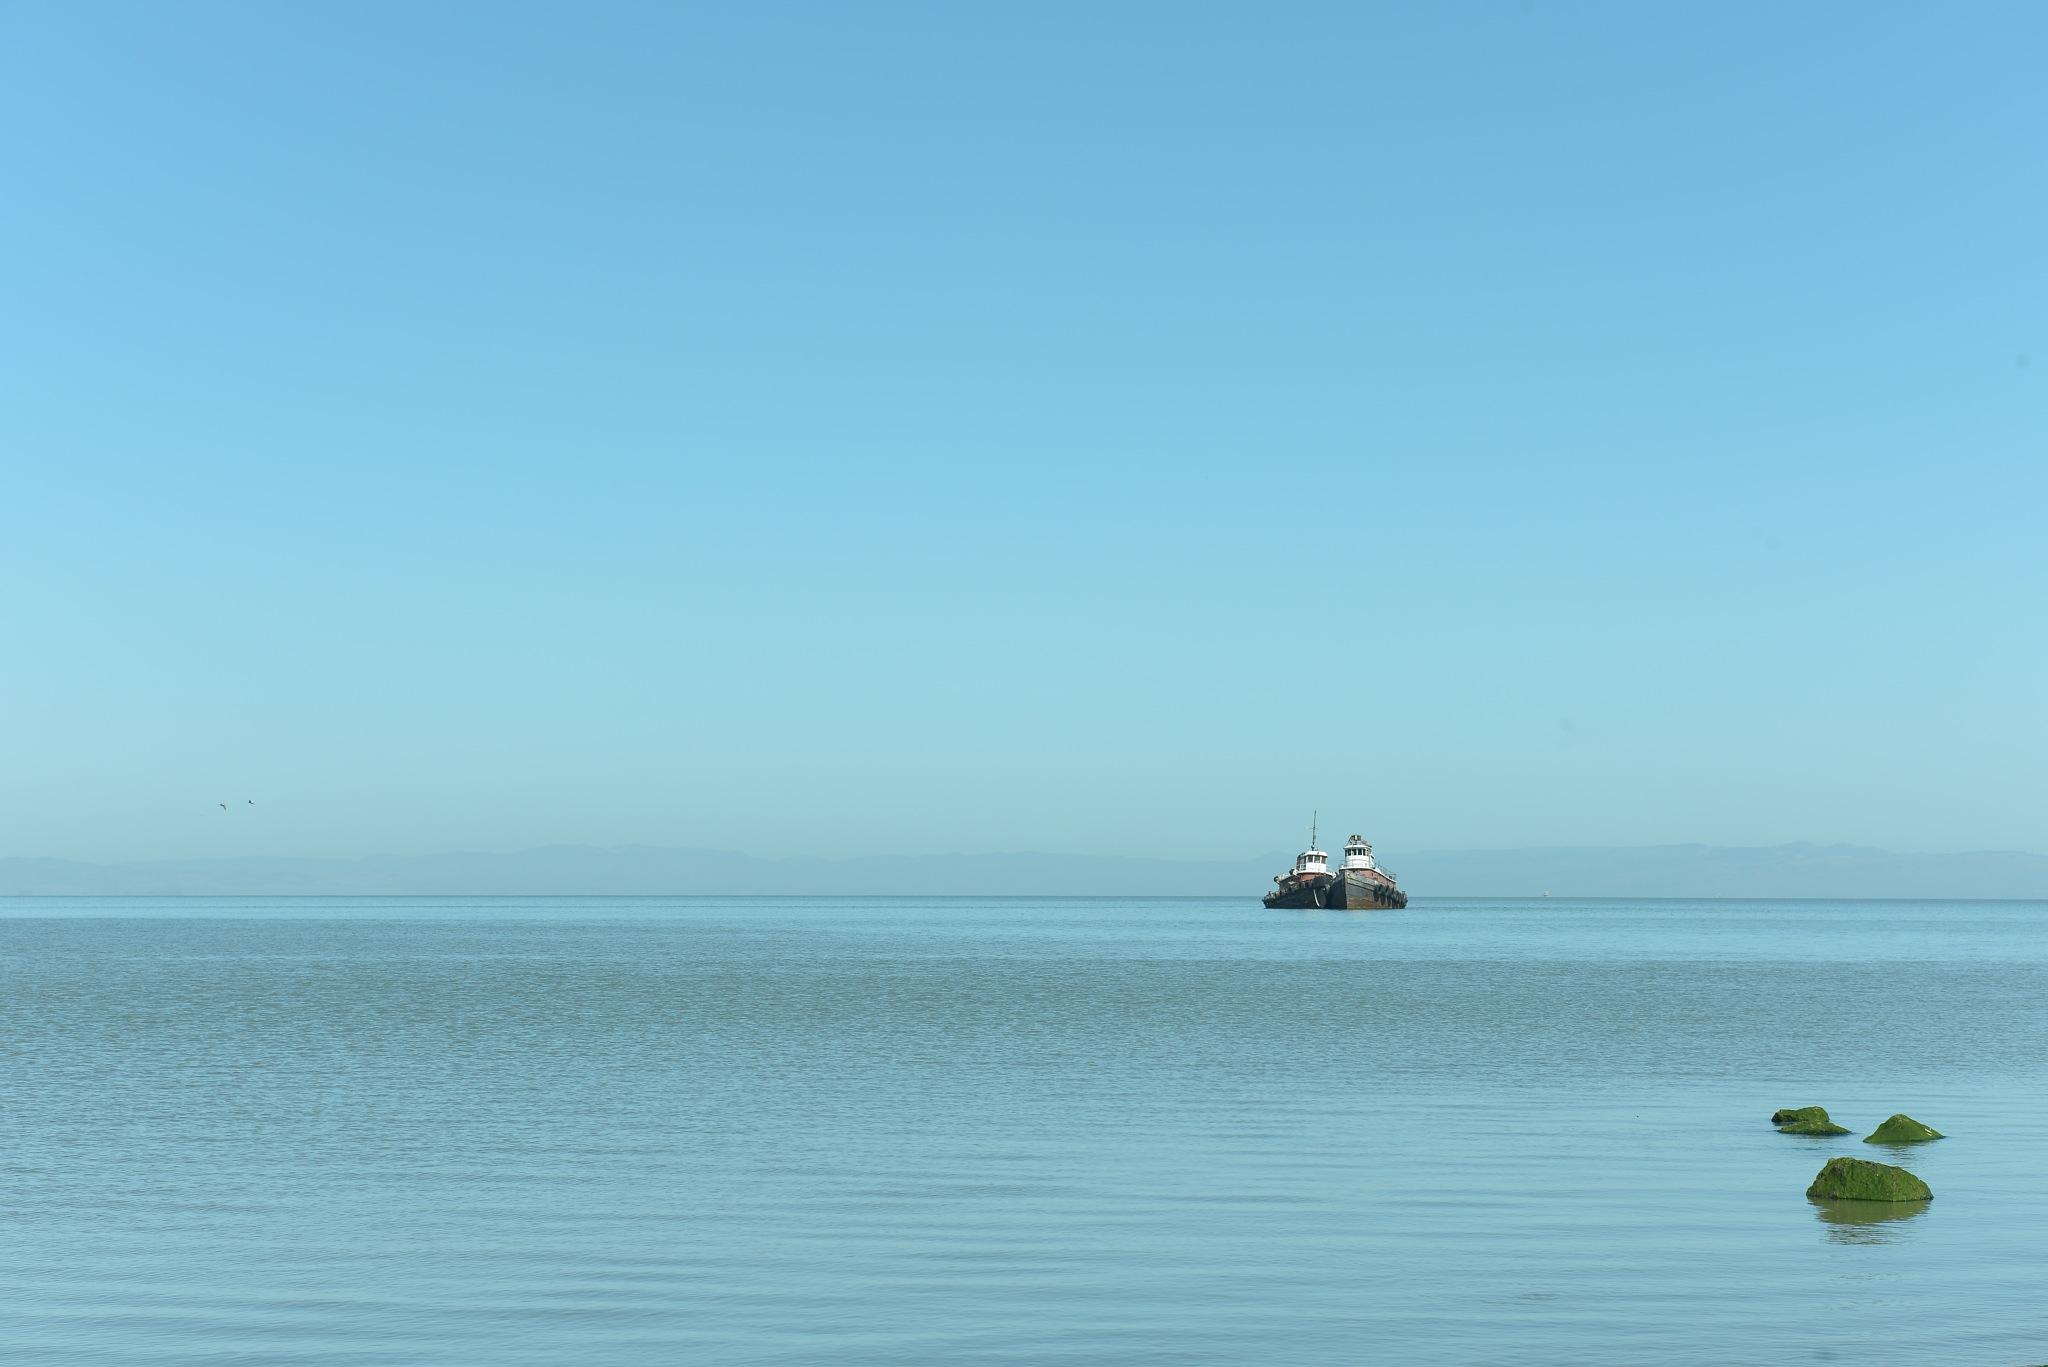 Two boats by Liliane Sticher